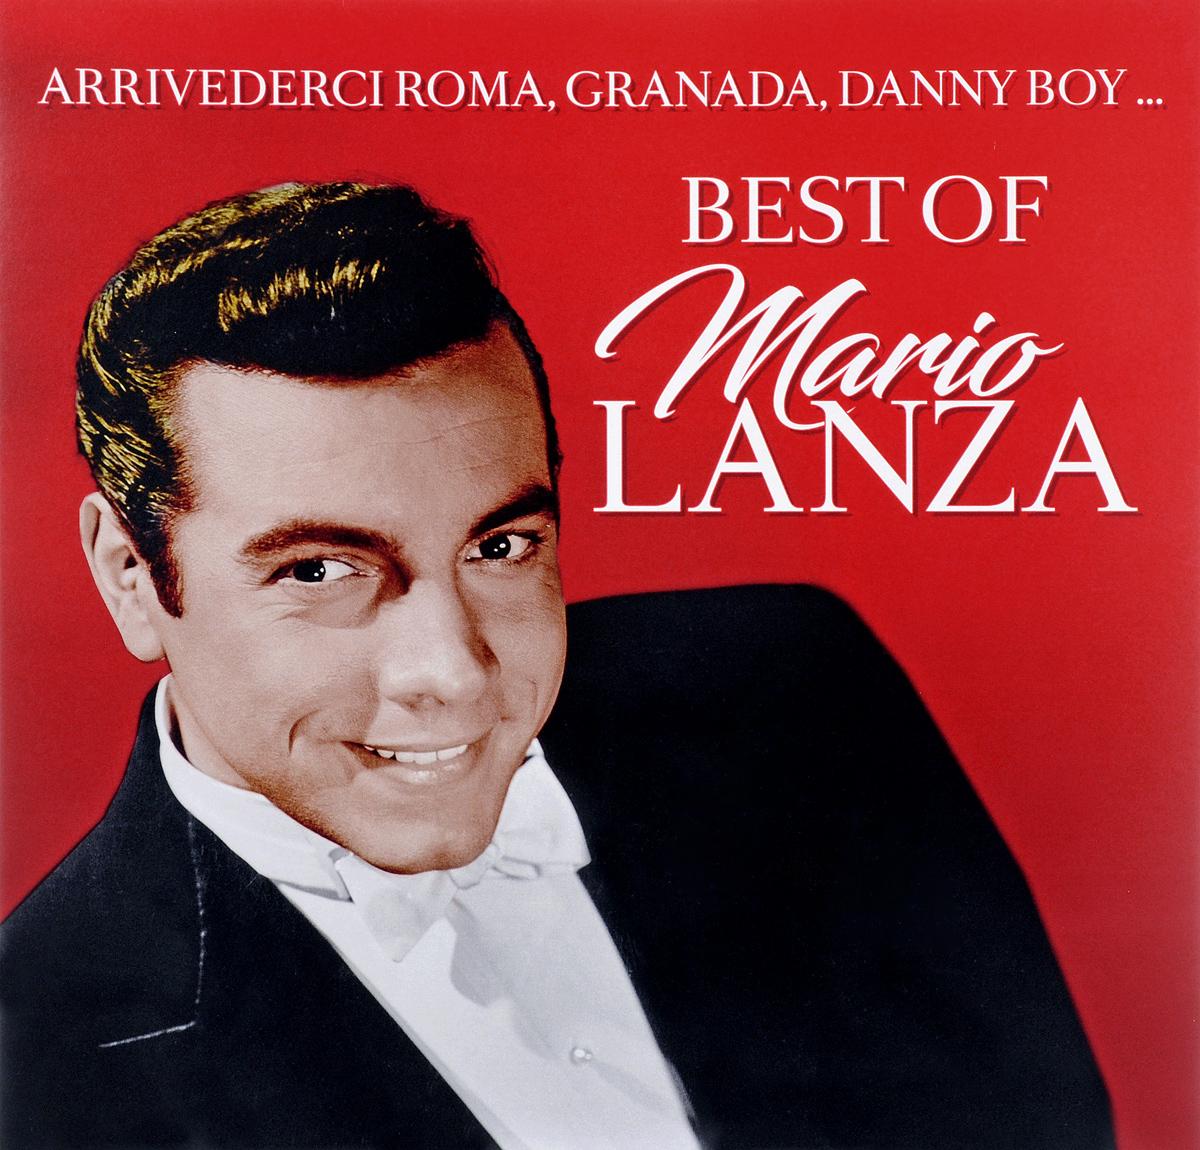 Марио Ланца Mario Lanza. The Best of Mario Lanza (LP) марио бионди mario biondi best of soul 2 cd